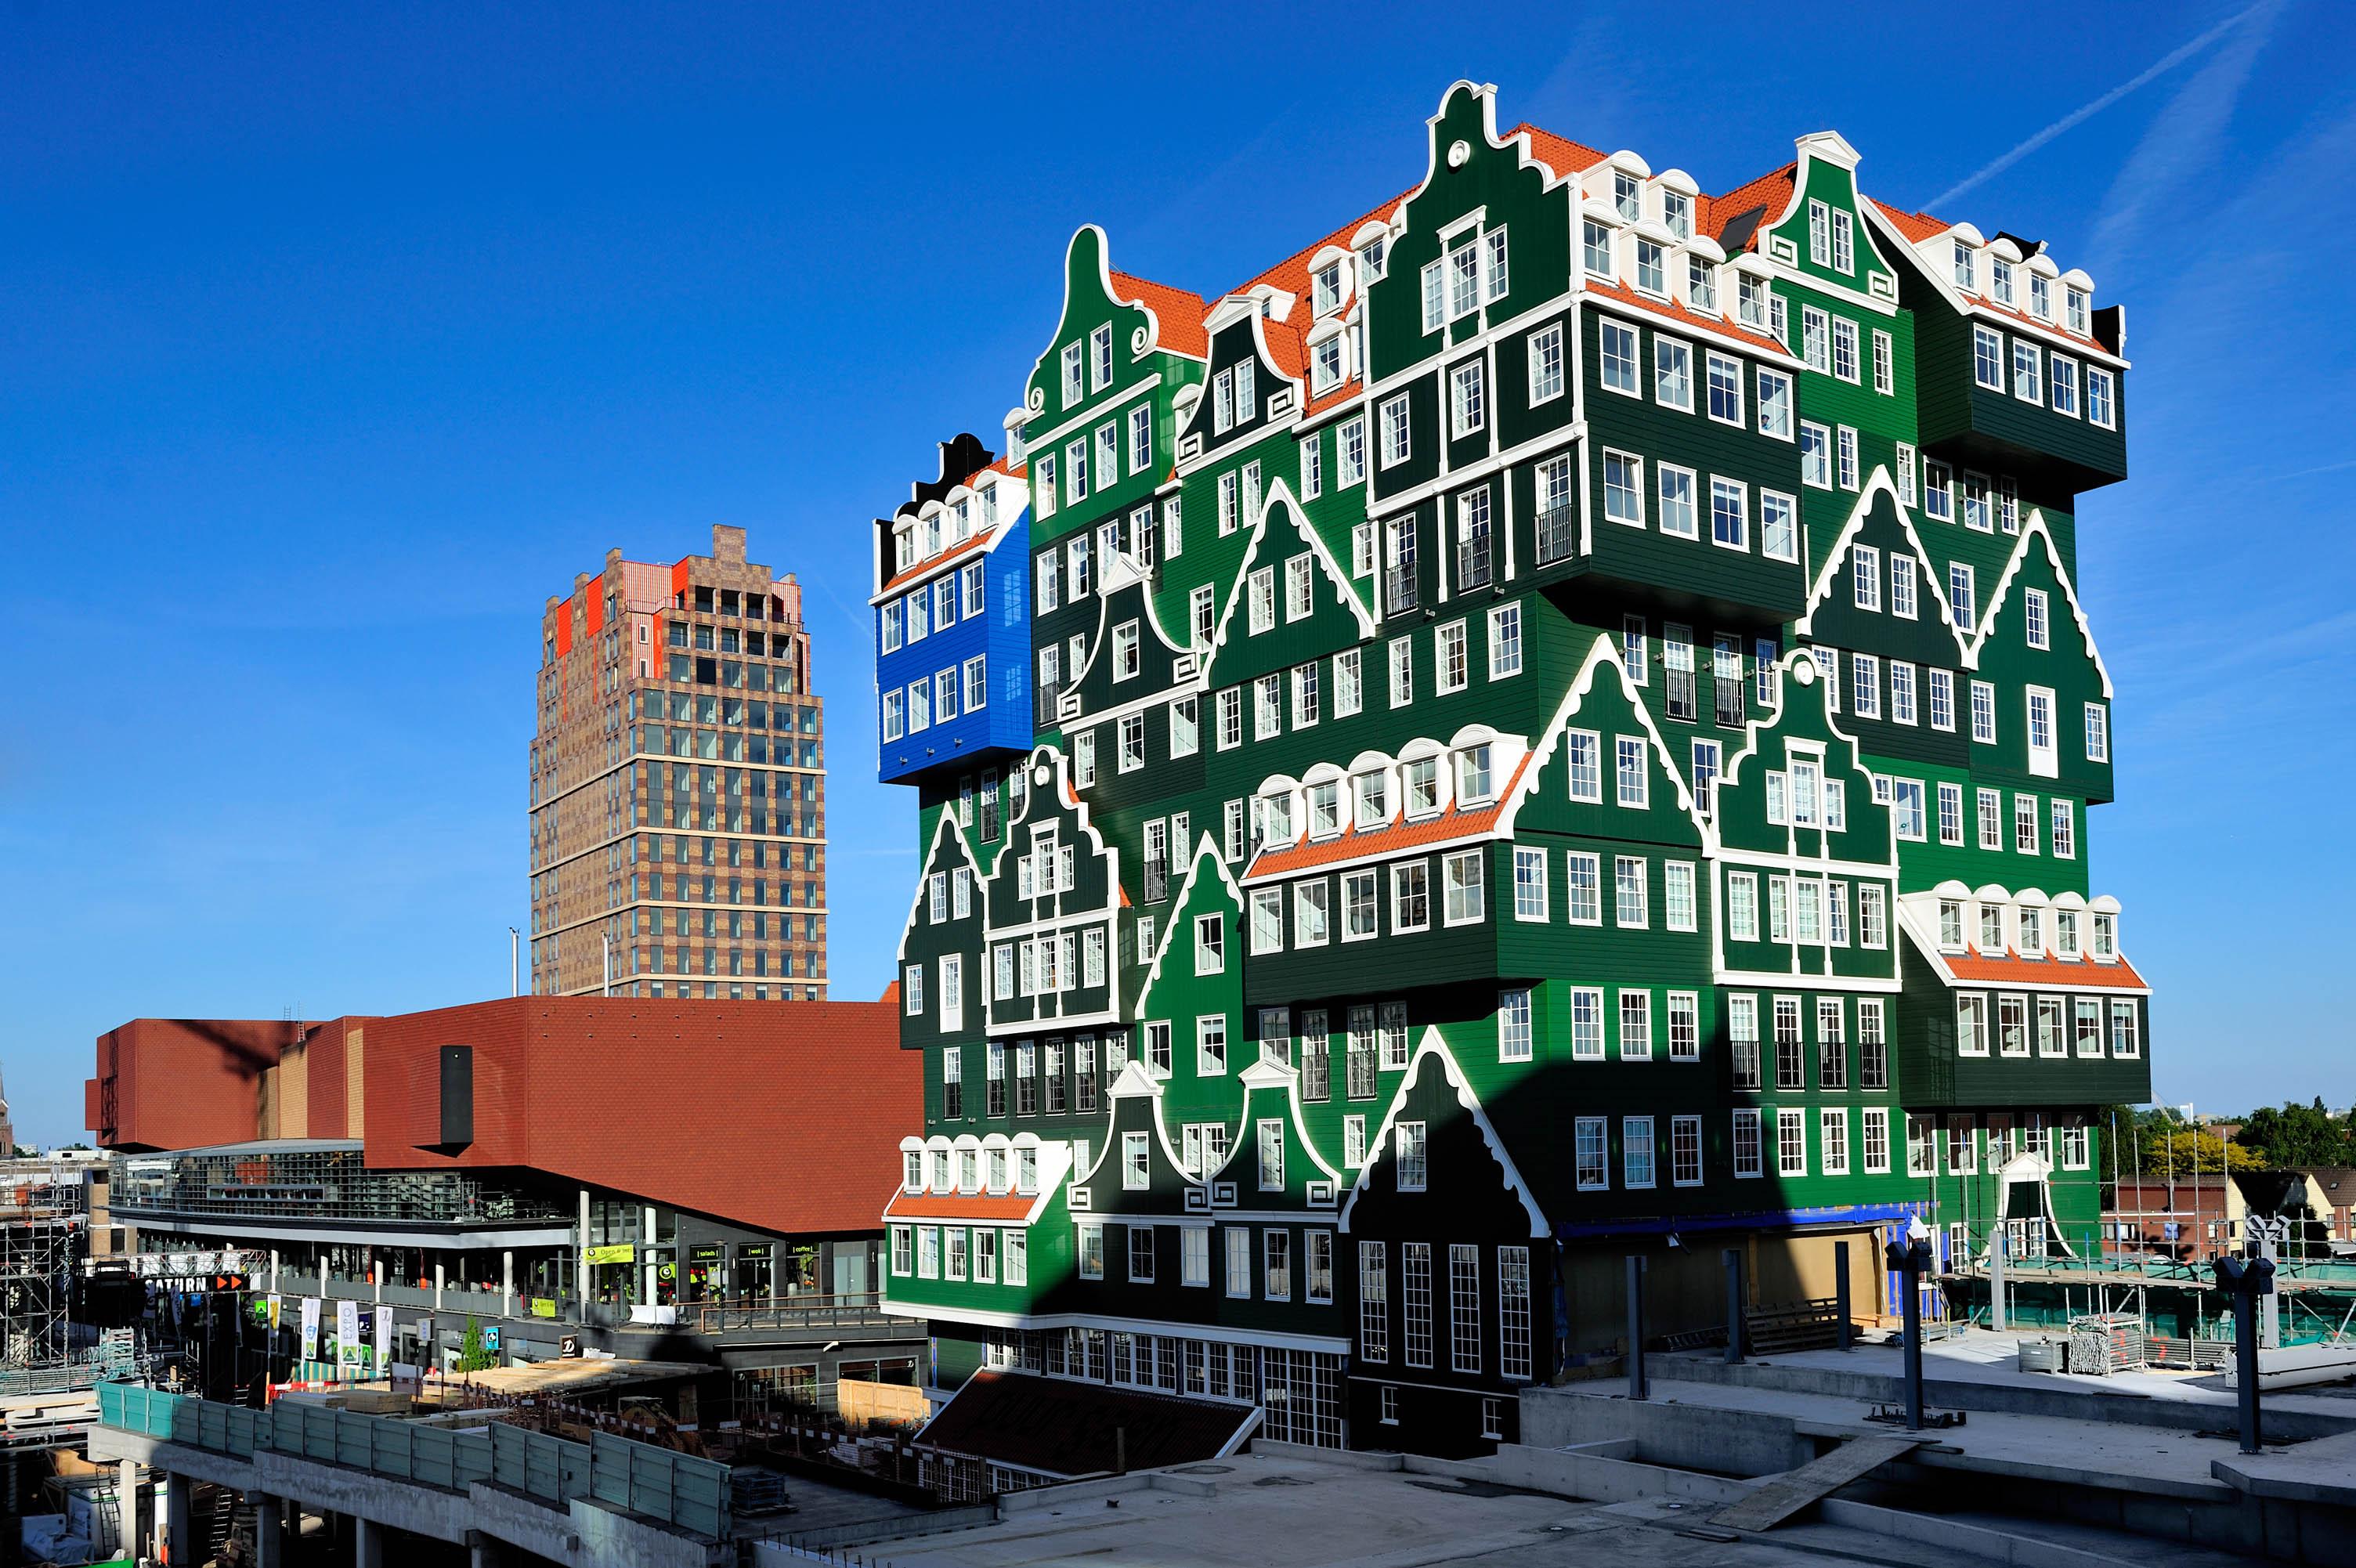 Hotel Amsterdam Zaandam Interveste Infonet